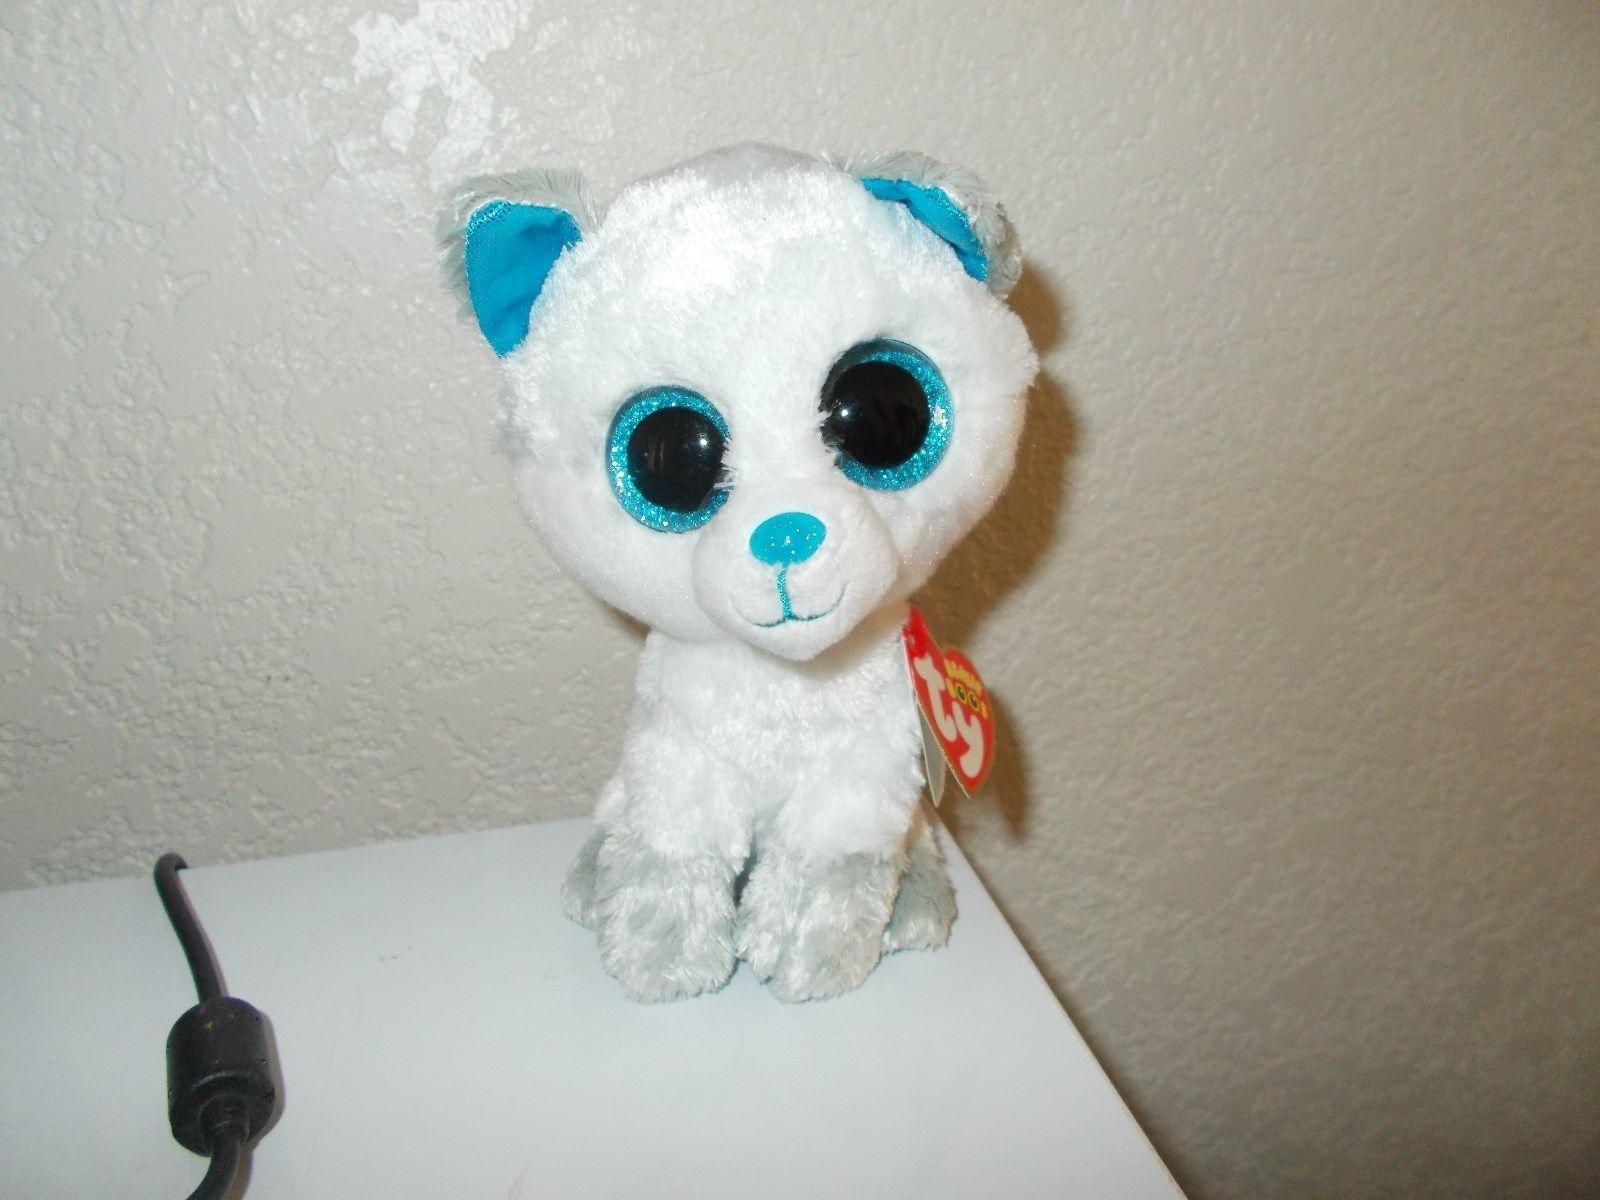 SIS the Cocker Spaniel Dog Internet Exclusive MWMT 6.5 inch TY Beanie Baby